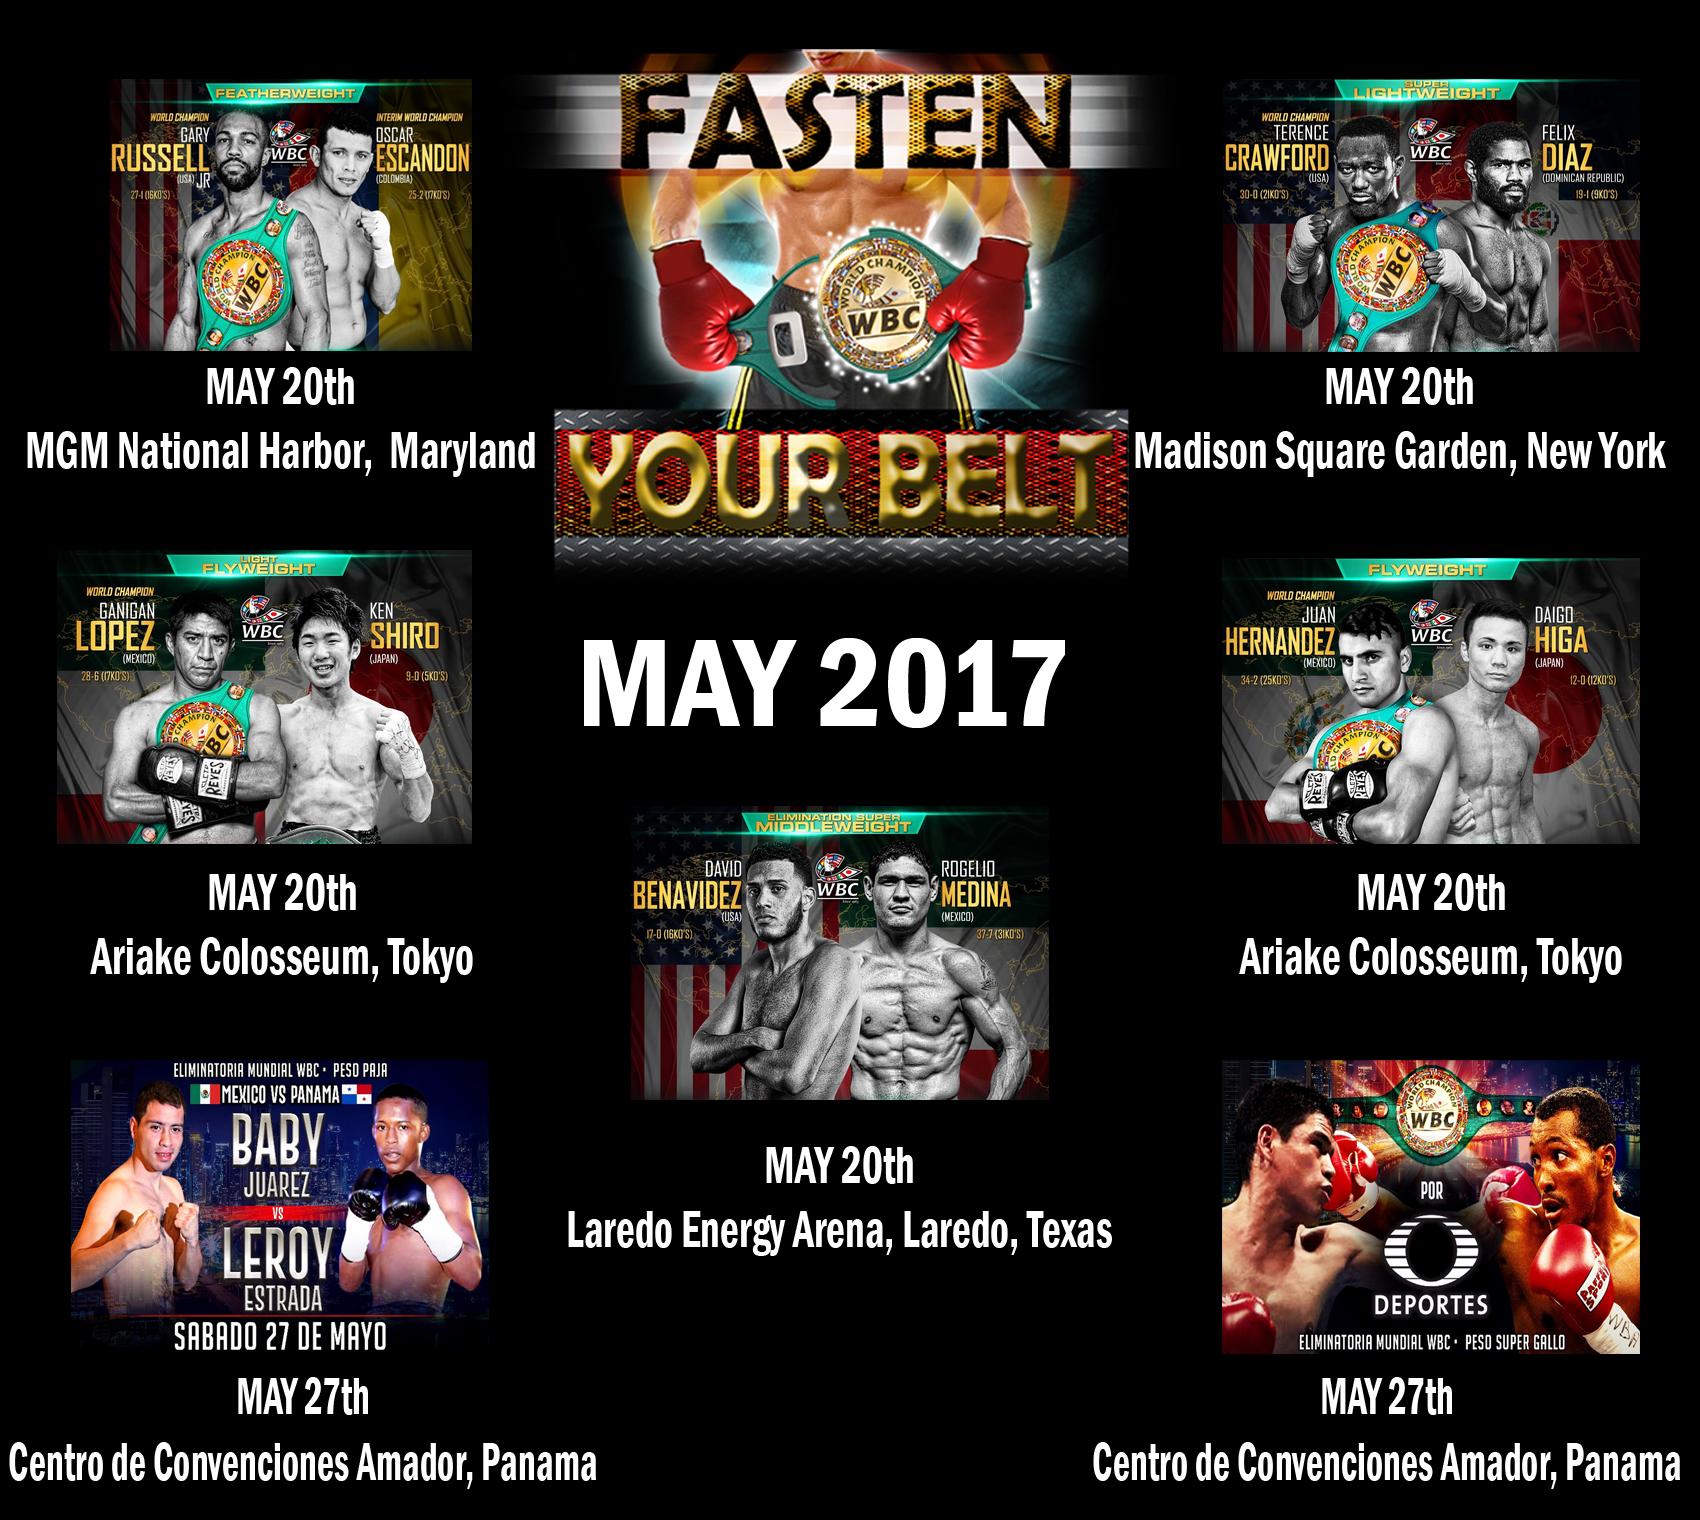 FASTEN-BELT-MAY-2017